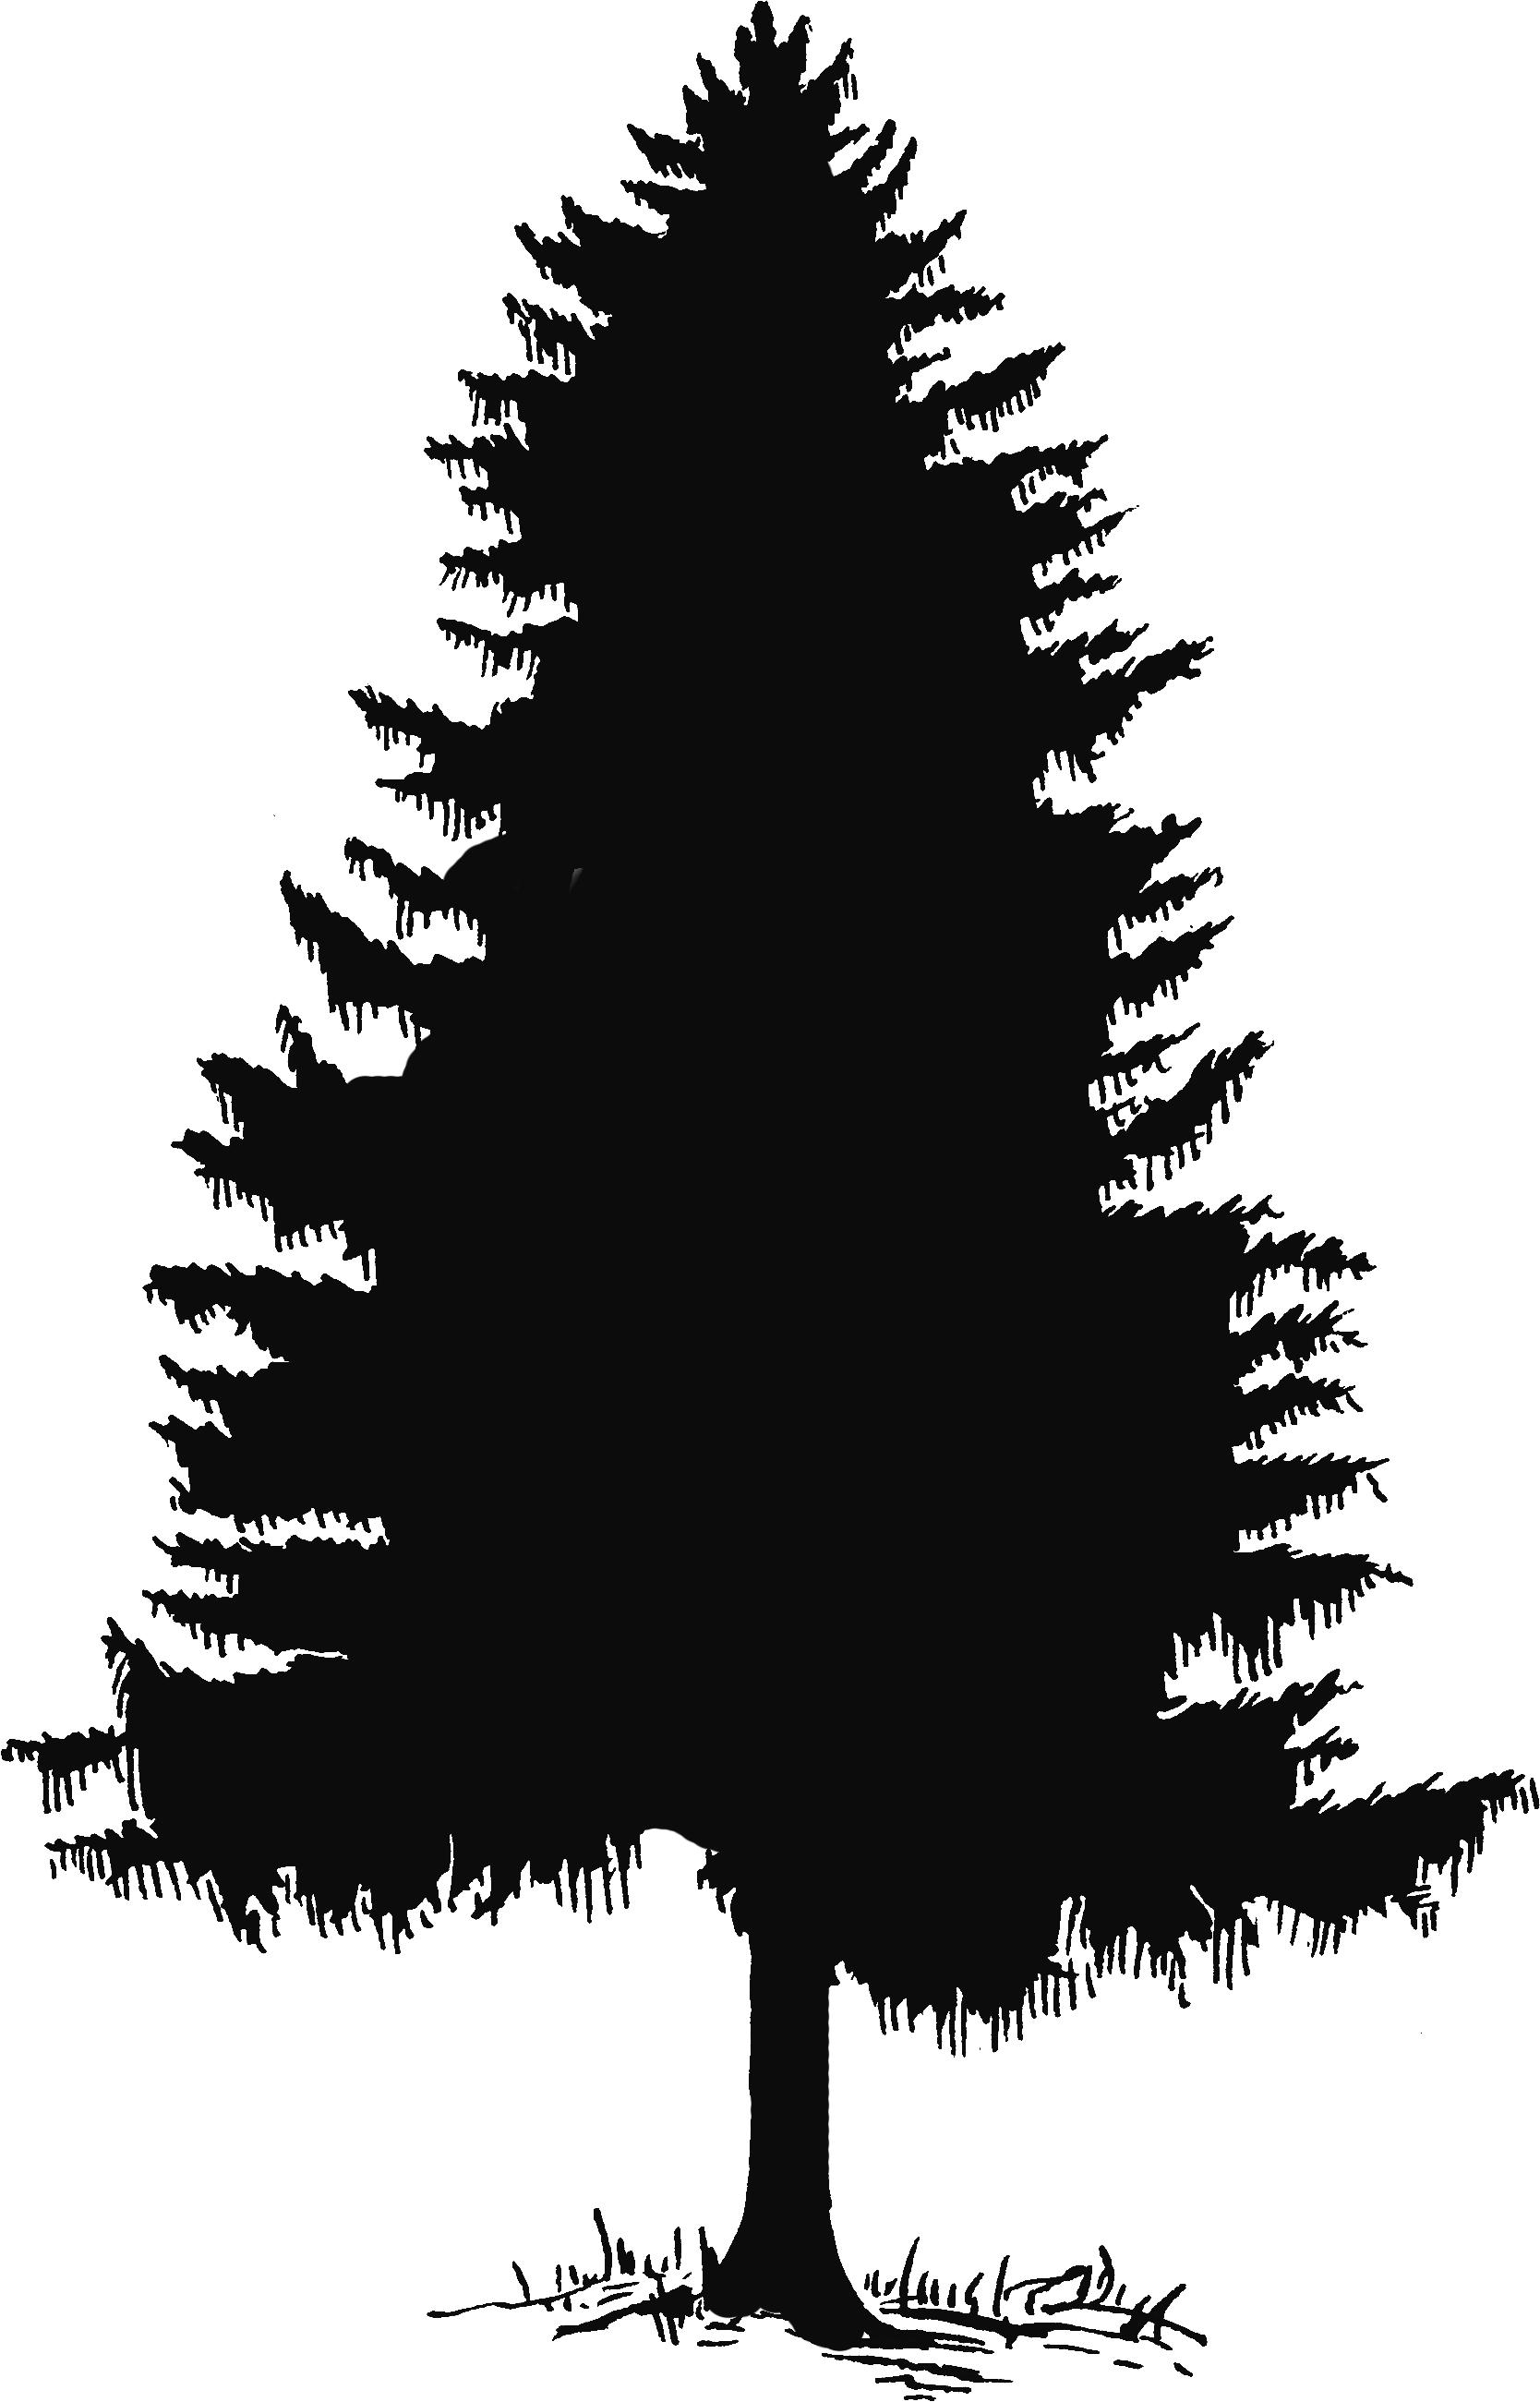 Douglas Fir Cliparts #2821947 - Fir Tree PNG Black And White